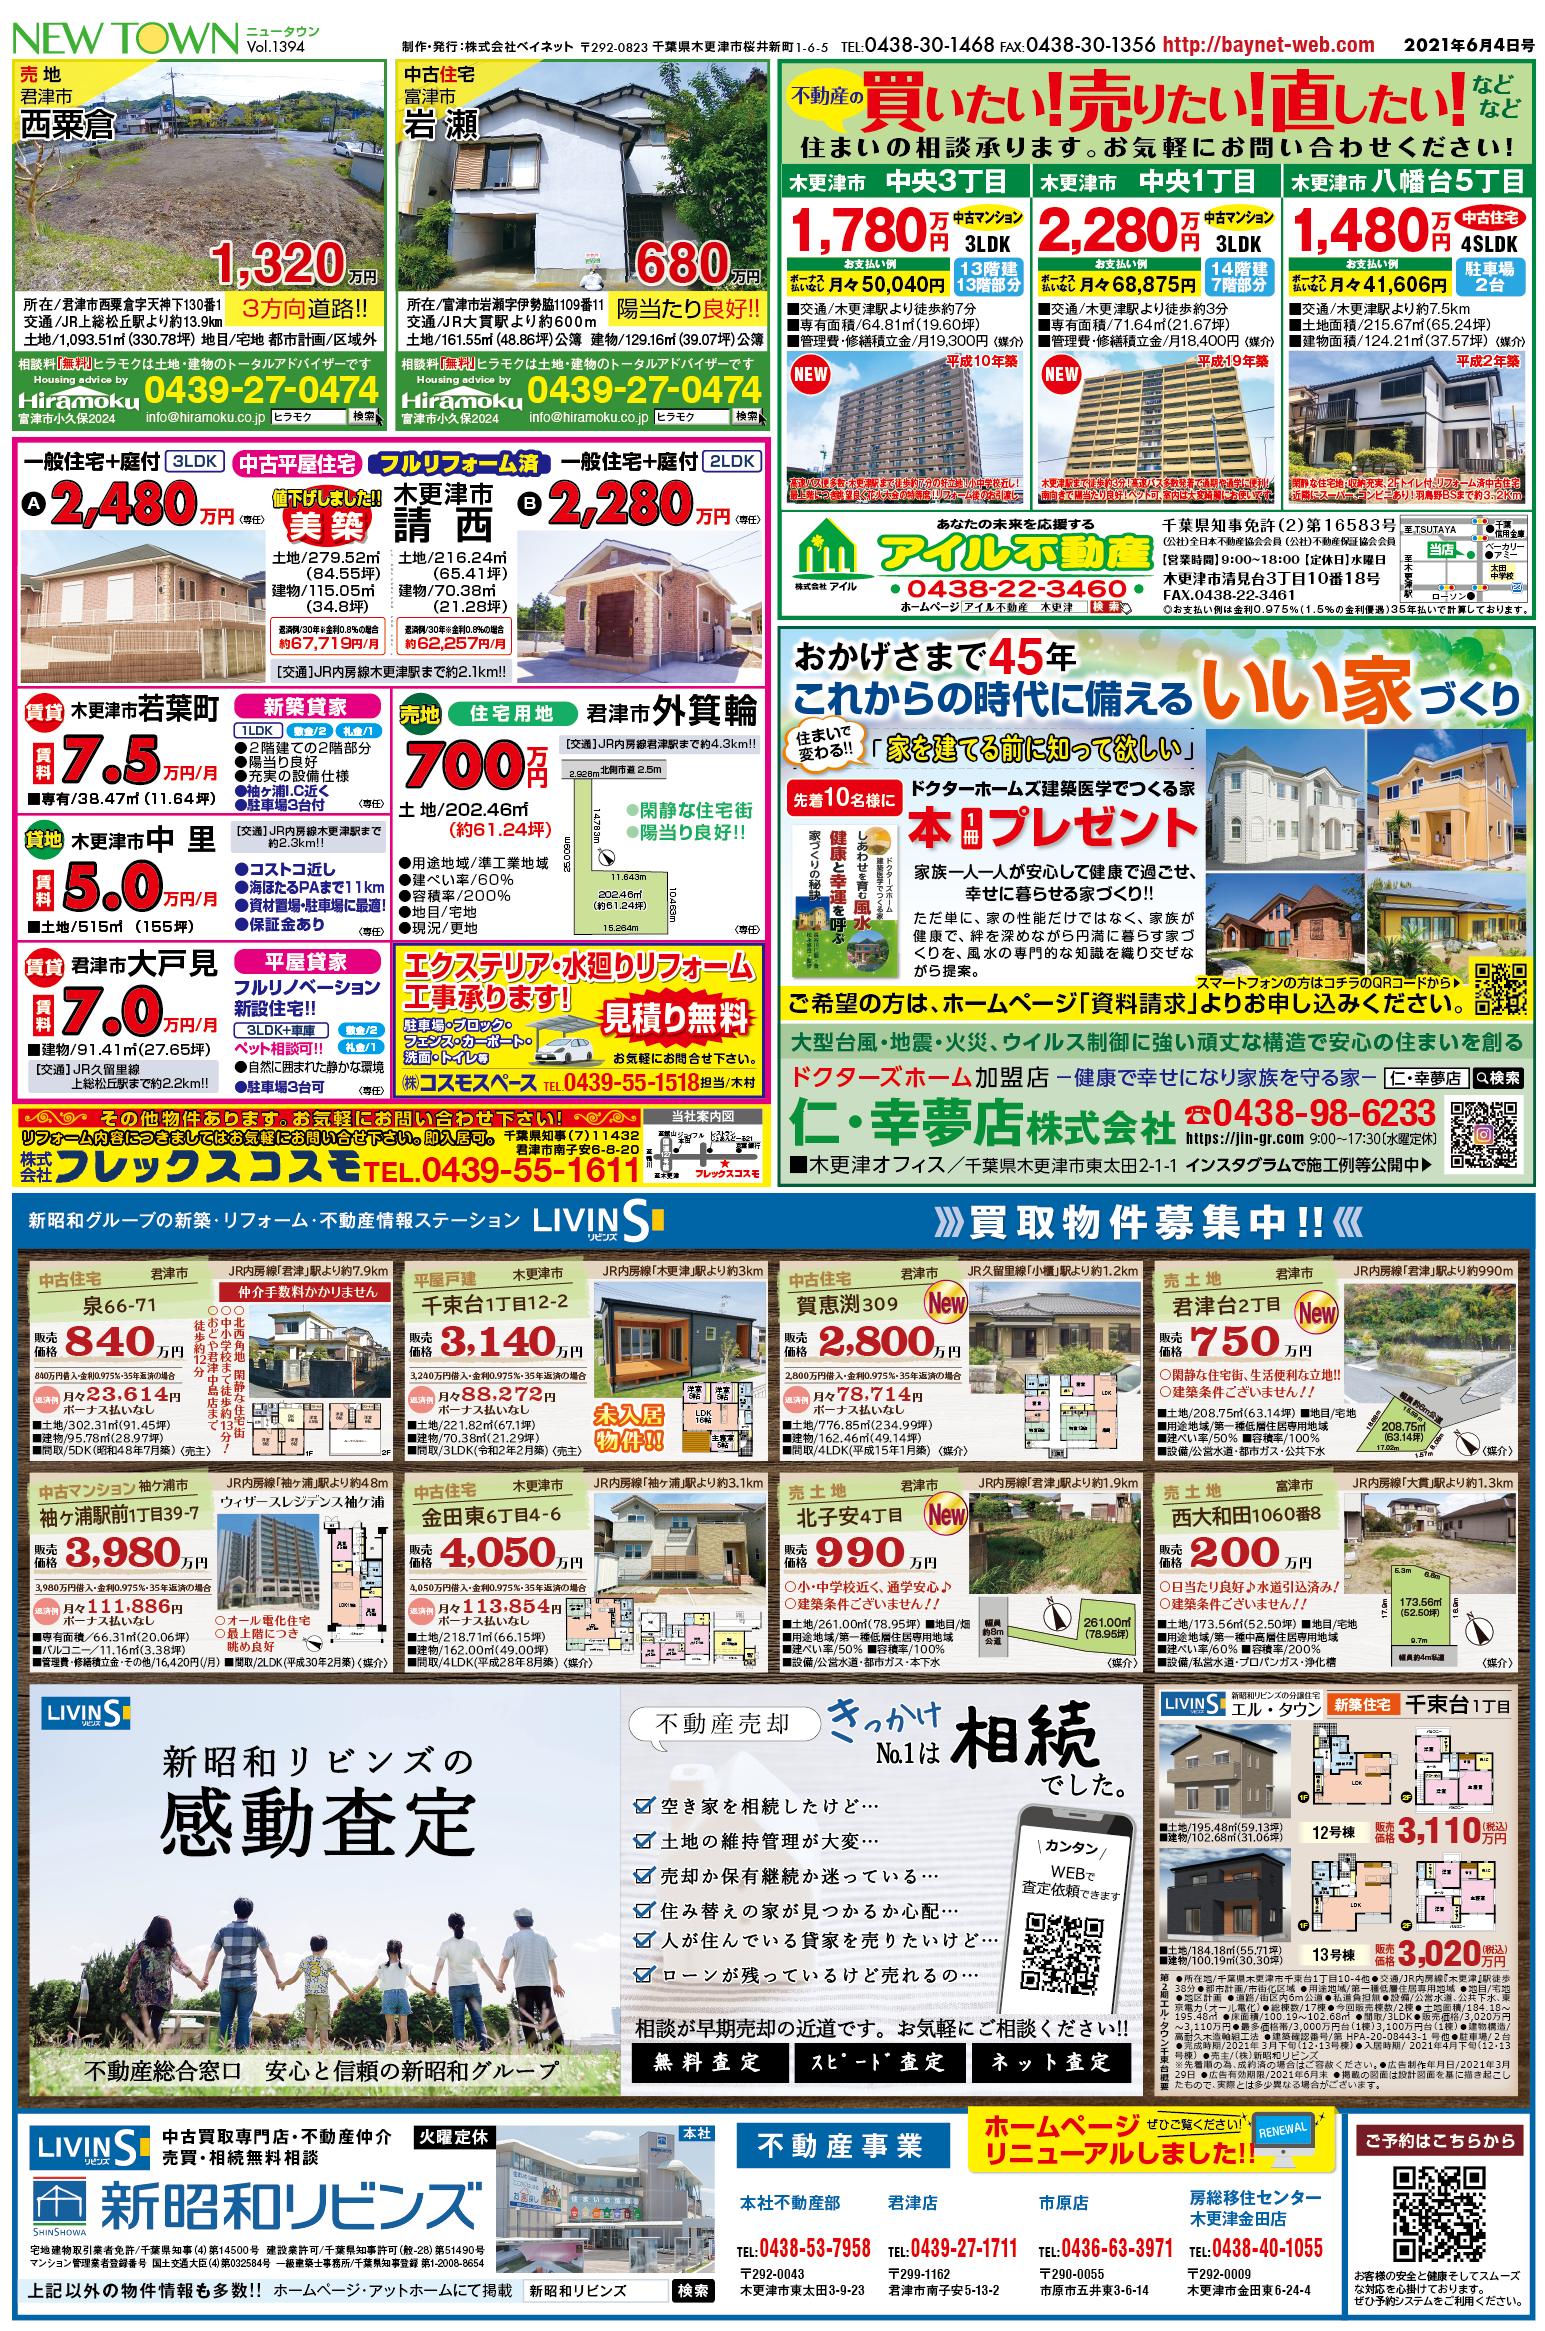 Hiramoku アイル不動産 フレックスコスモ 仁・幸夢店 新昭和リビンズ